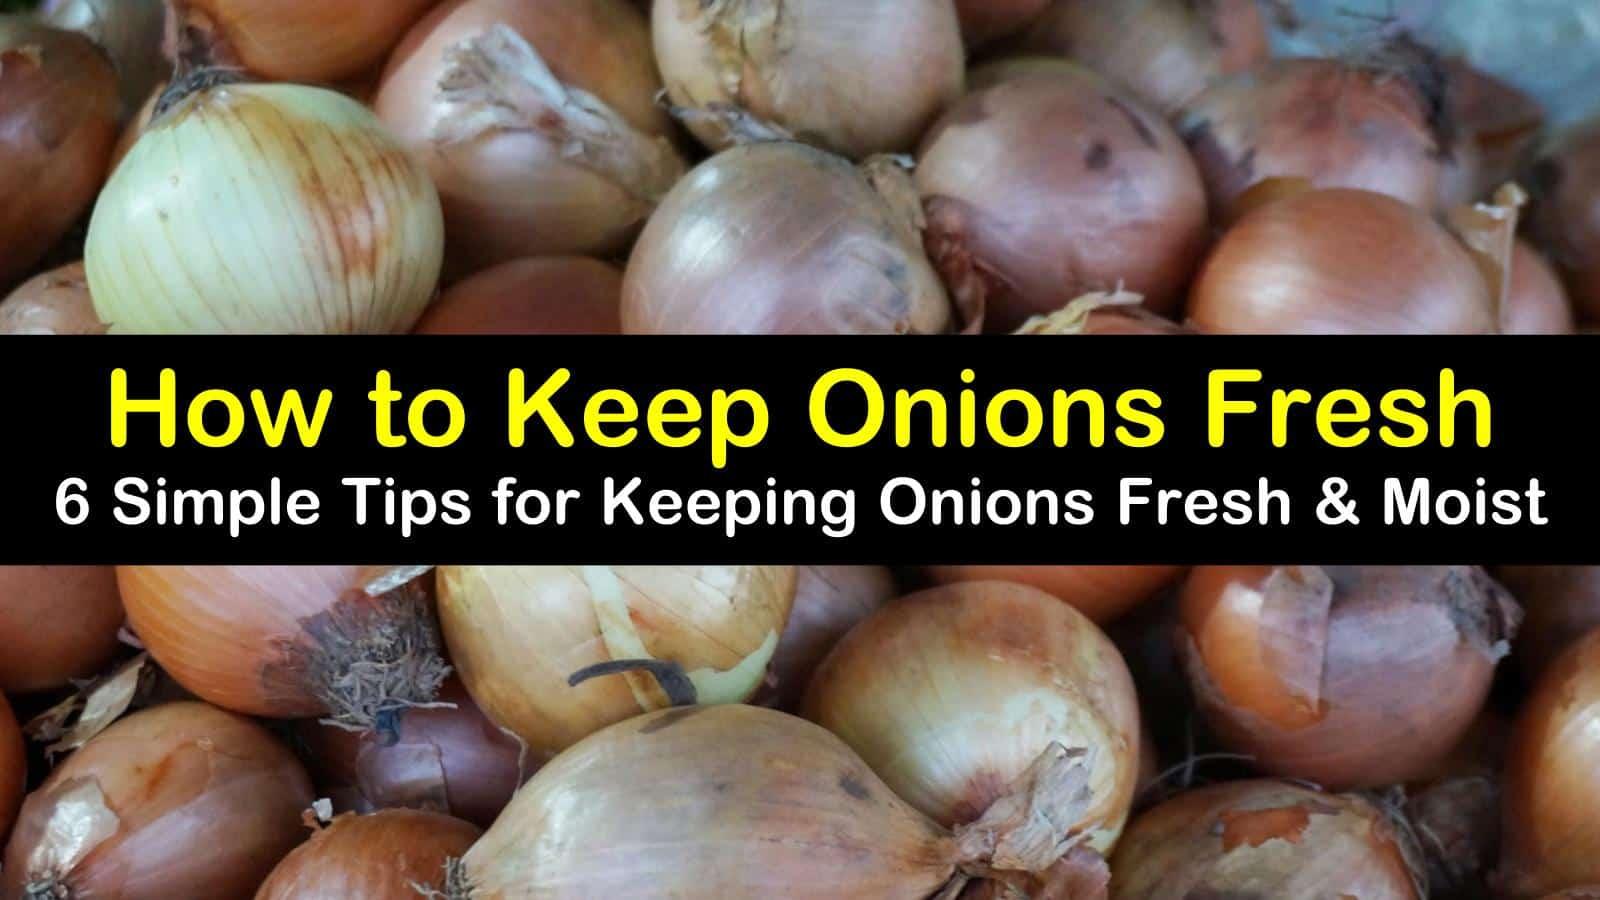 how to keep onions fresh titleimg1